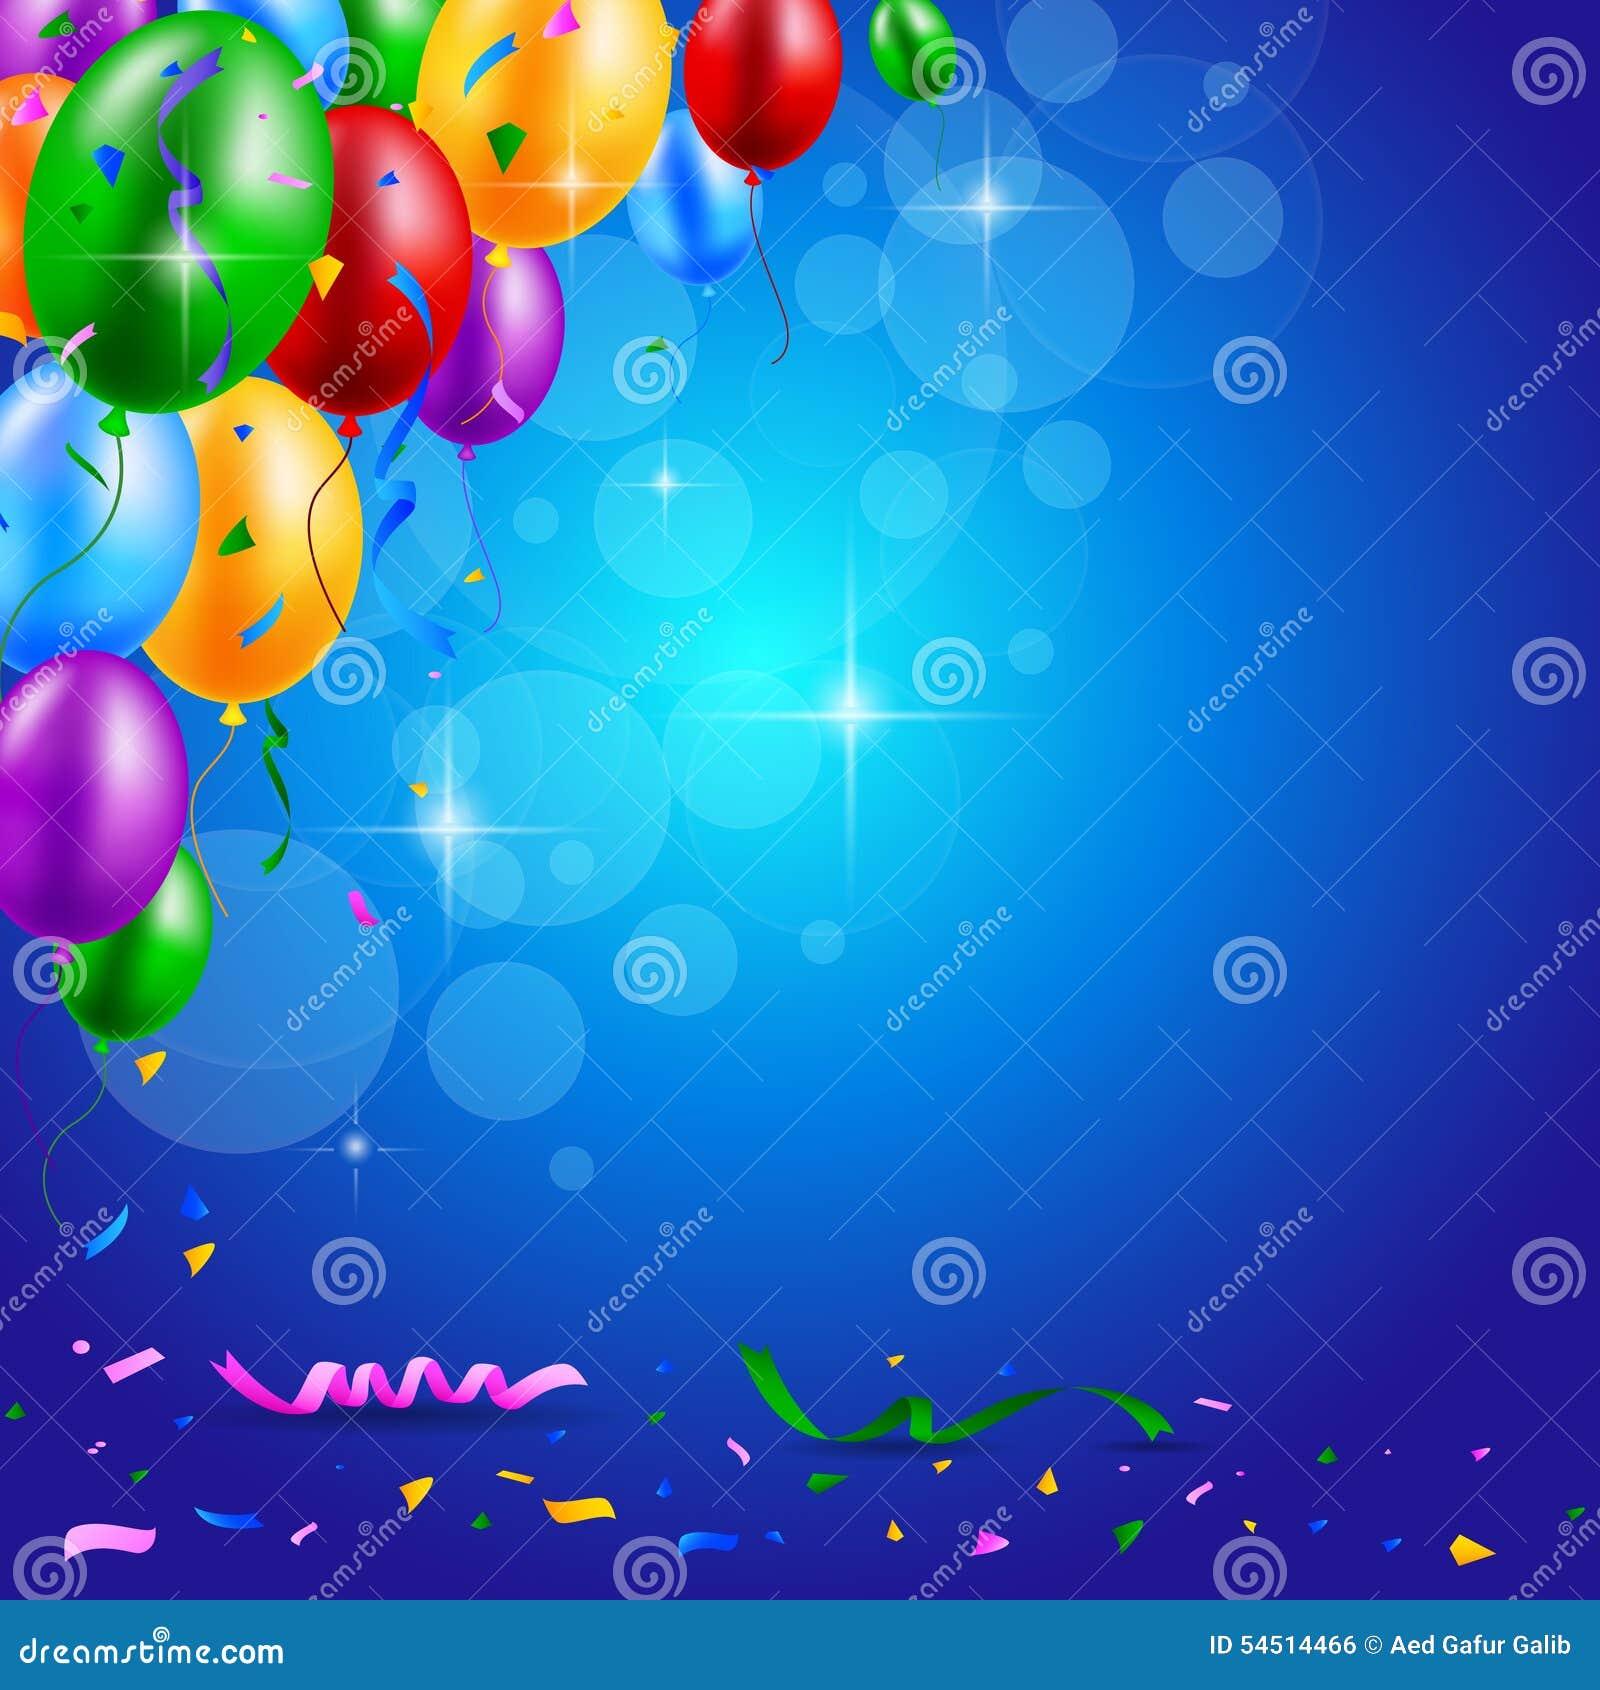 Invitation For 18Th Birthday Design as beautiful invitation layout